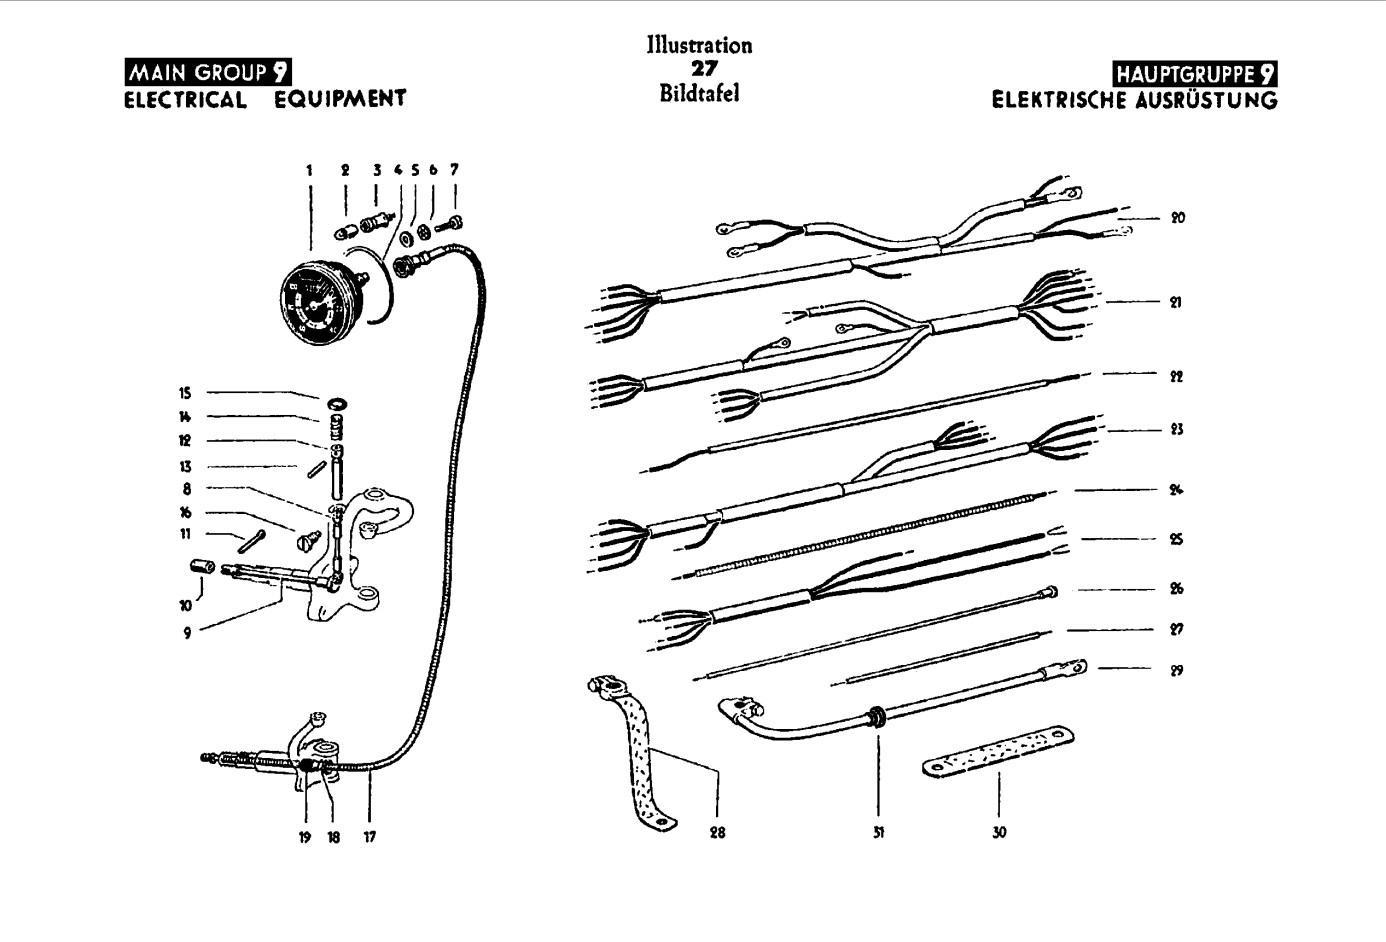 1946 Parts book Main Group 9 Illustration 27